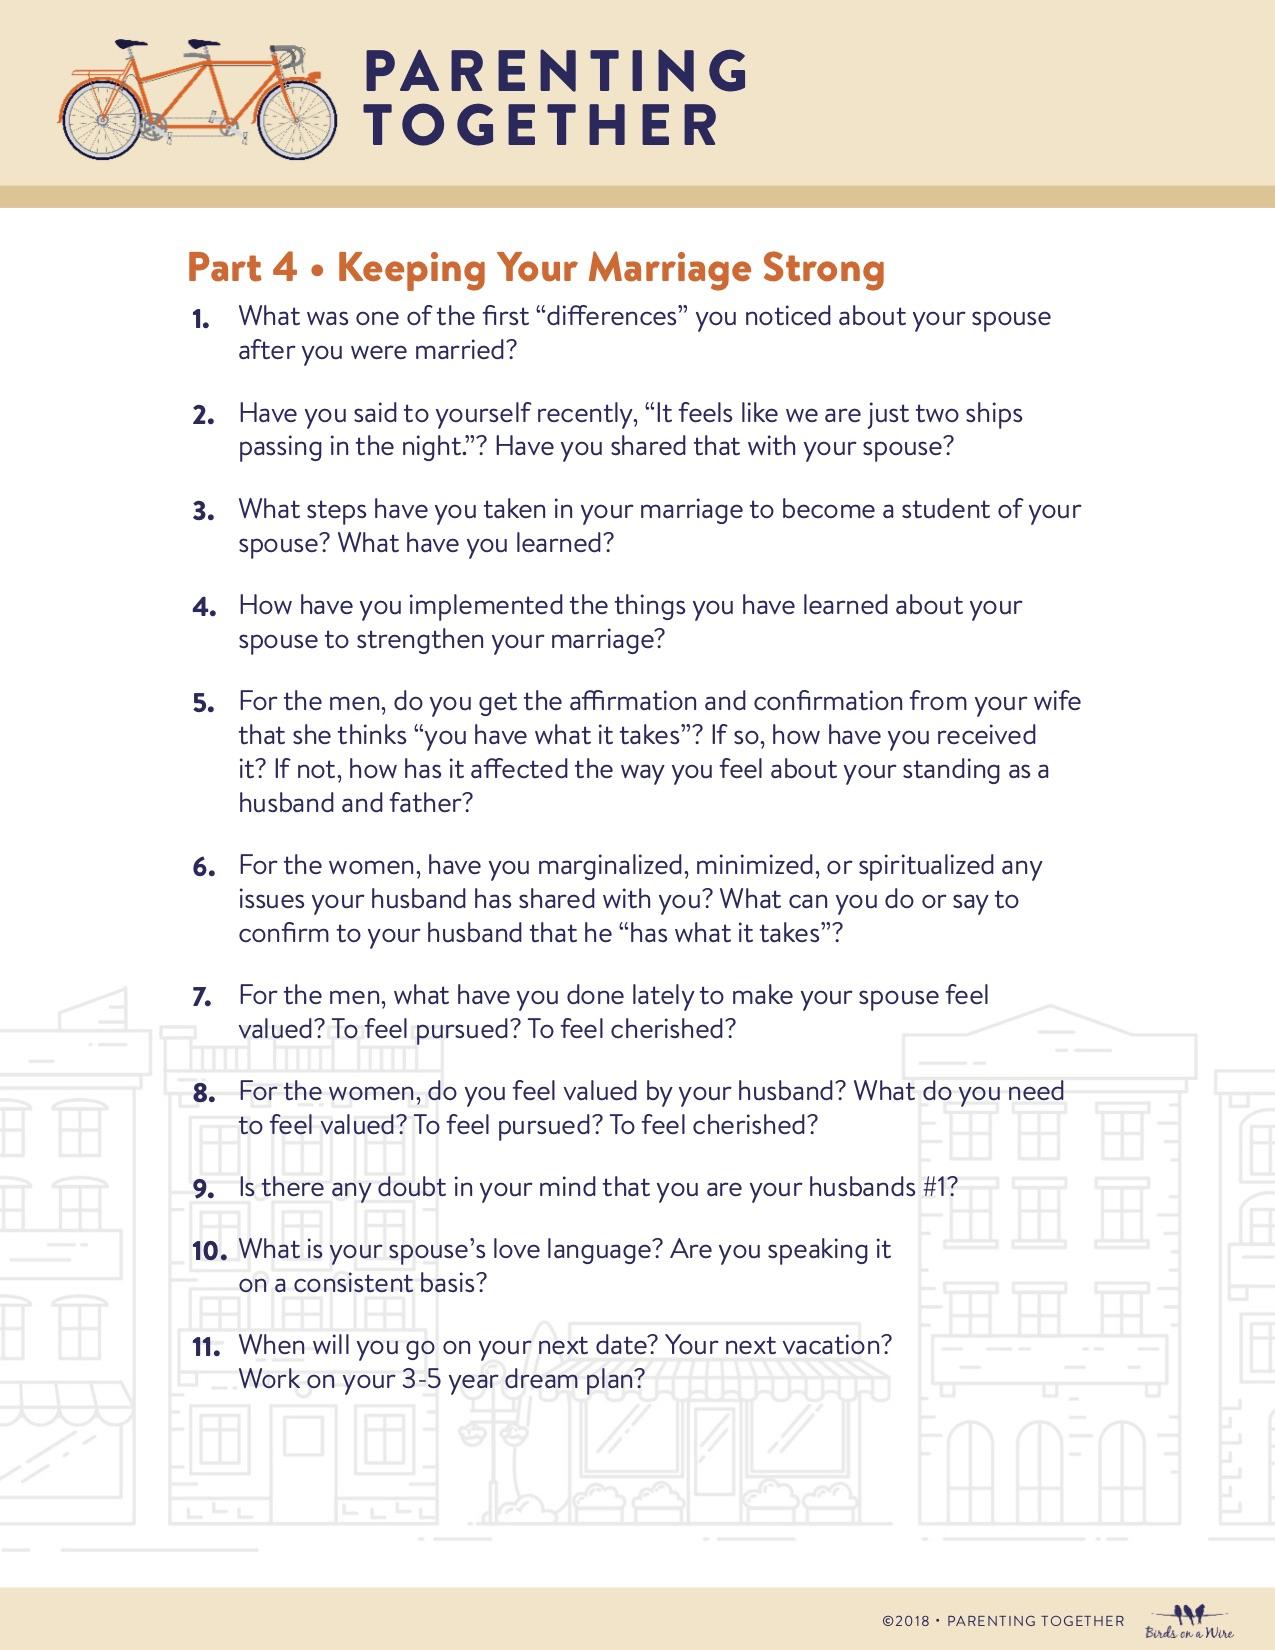 parenting-together-page-4.jpg